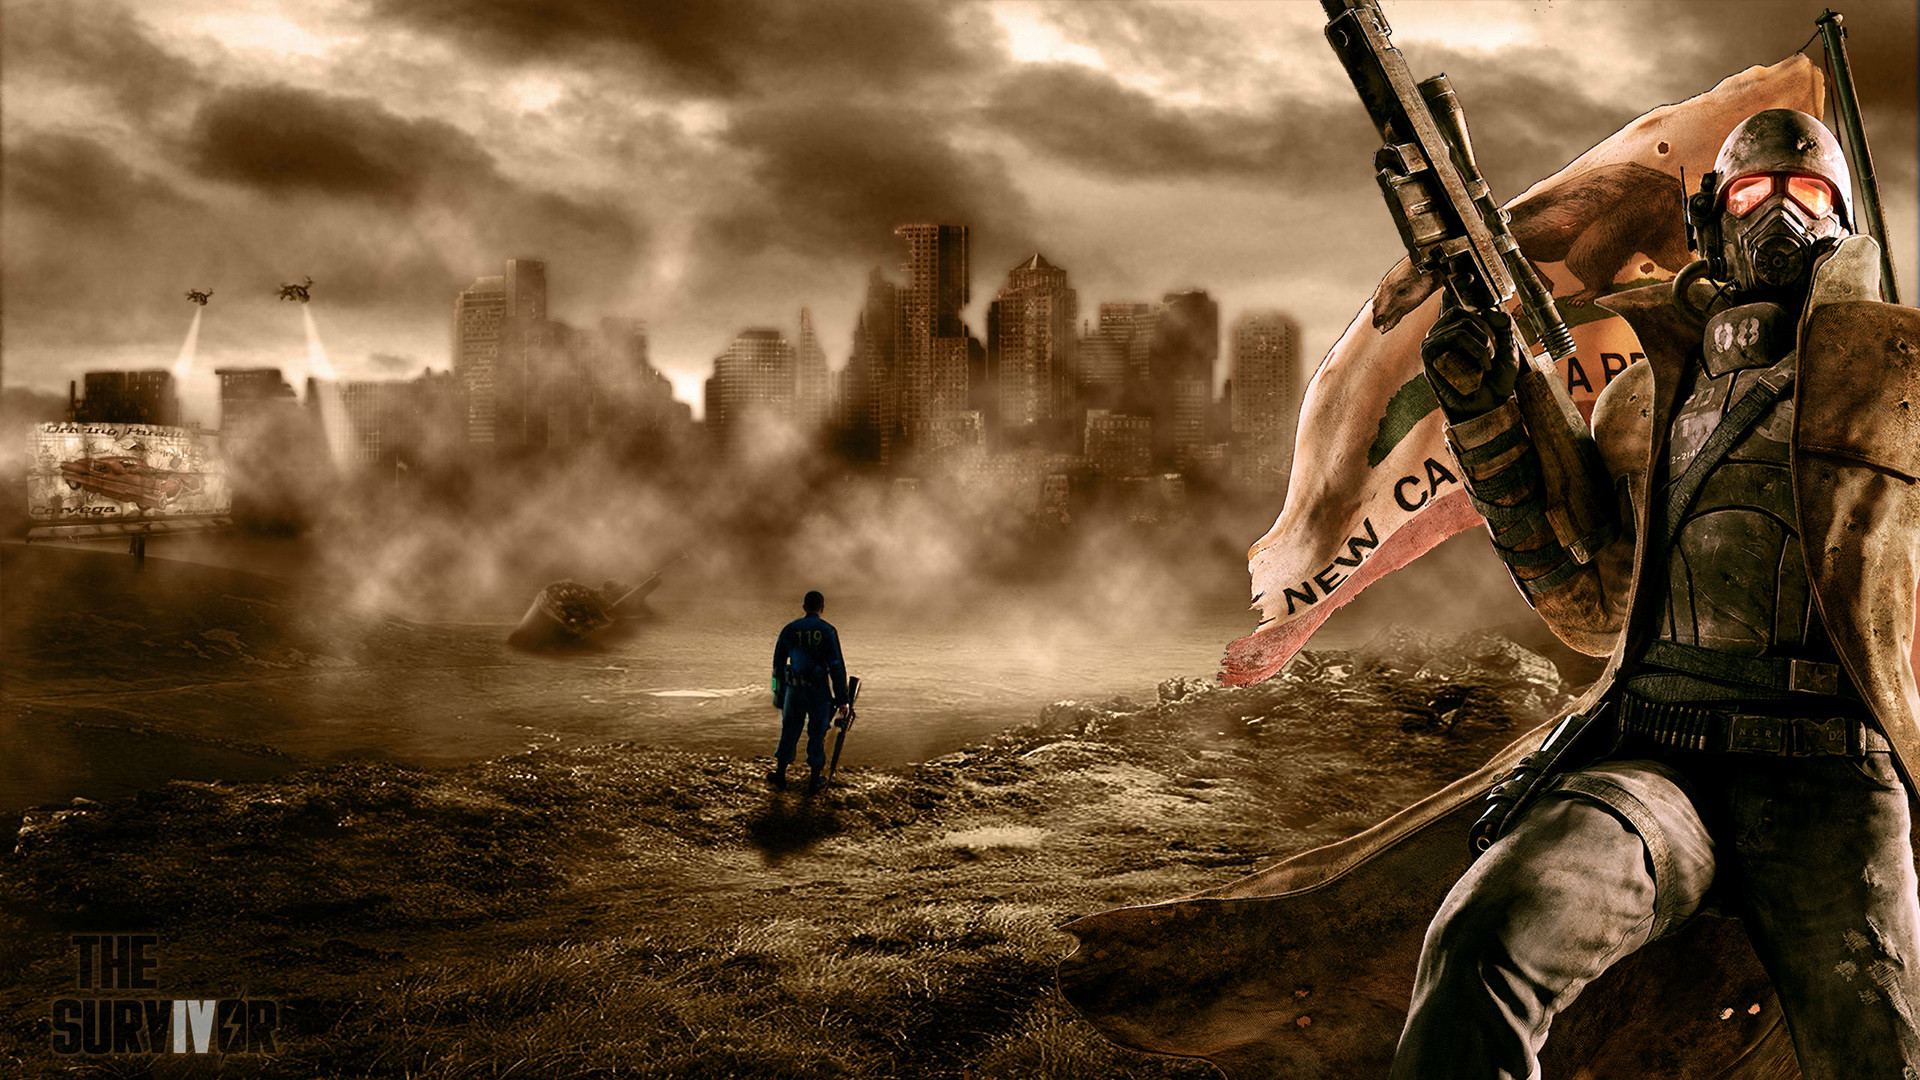 Fallout_4_Wallpaper_The_Survivor-by-bajumlufias